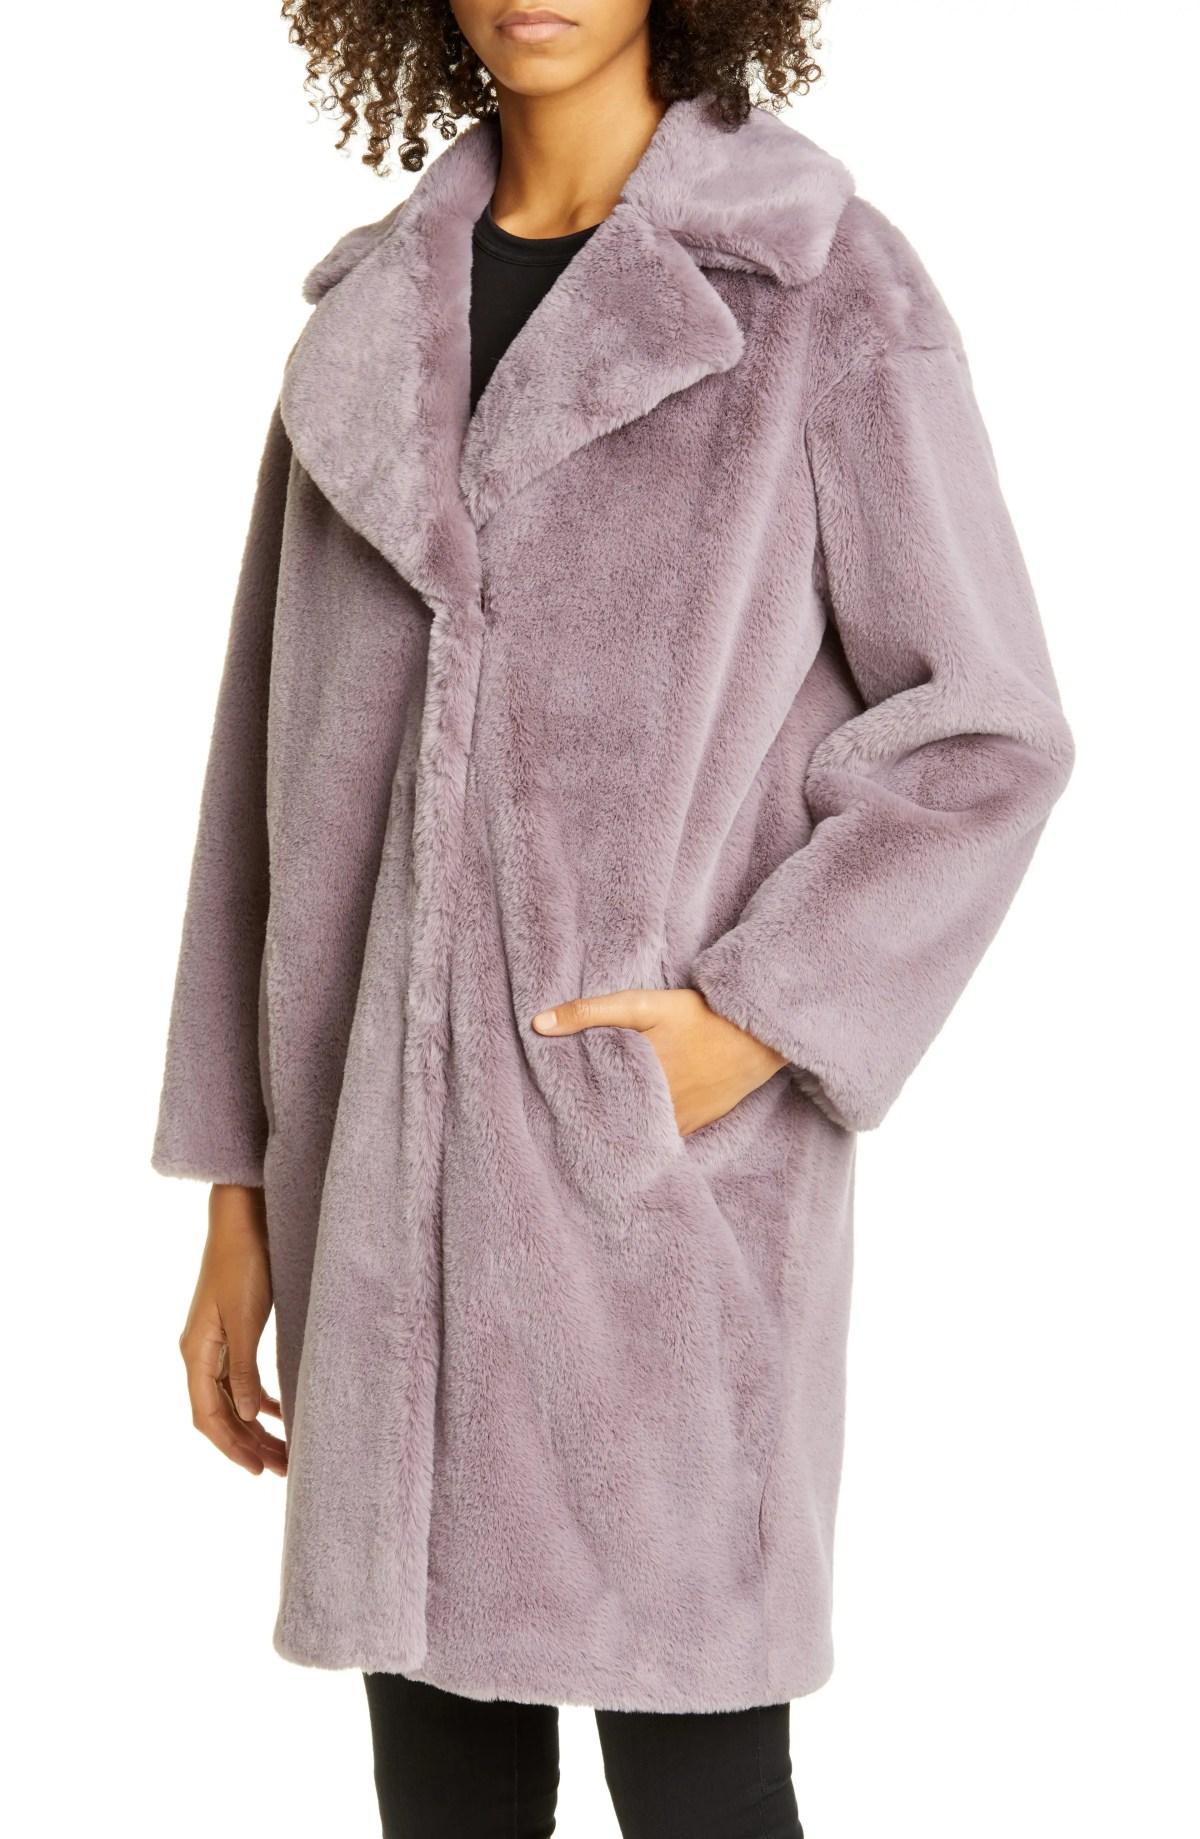 STAND STUDIO Camille Faux Fur Cocoon Coat, Main, color, 5140 DUSTY LAVENDER